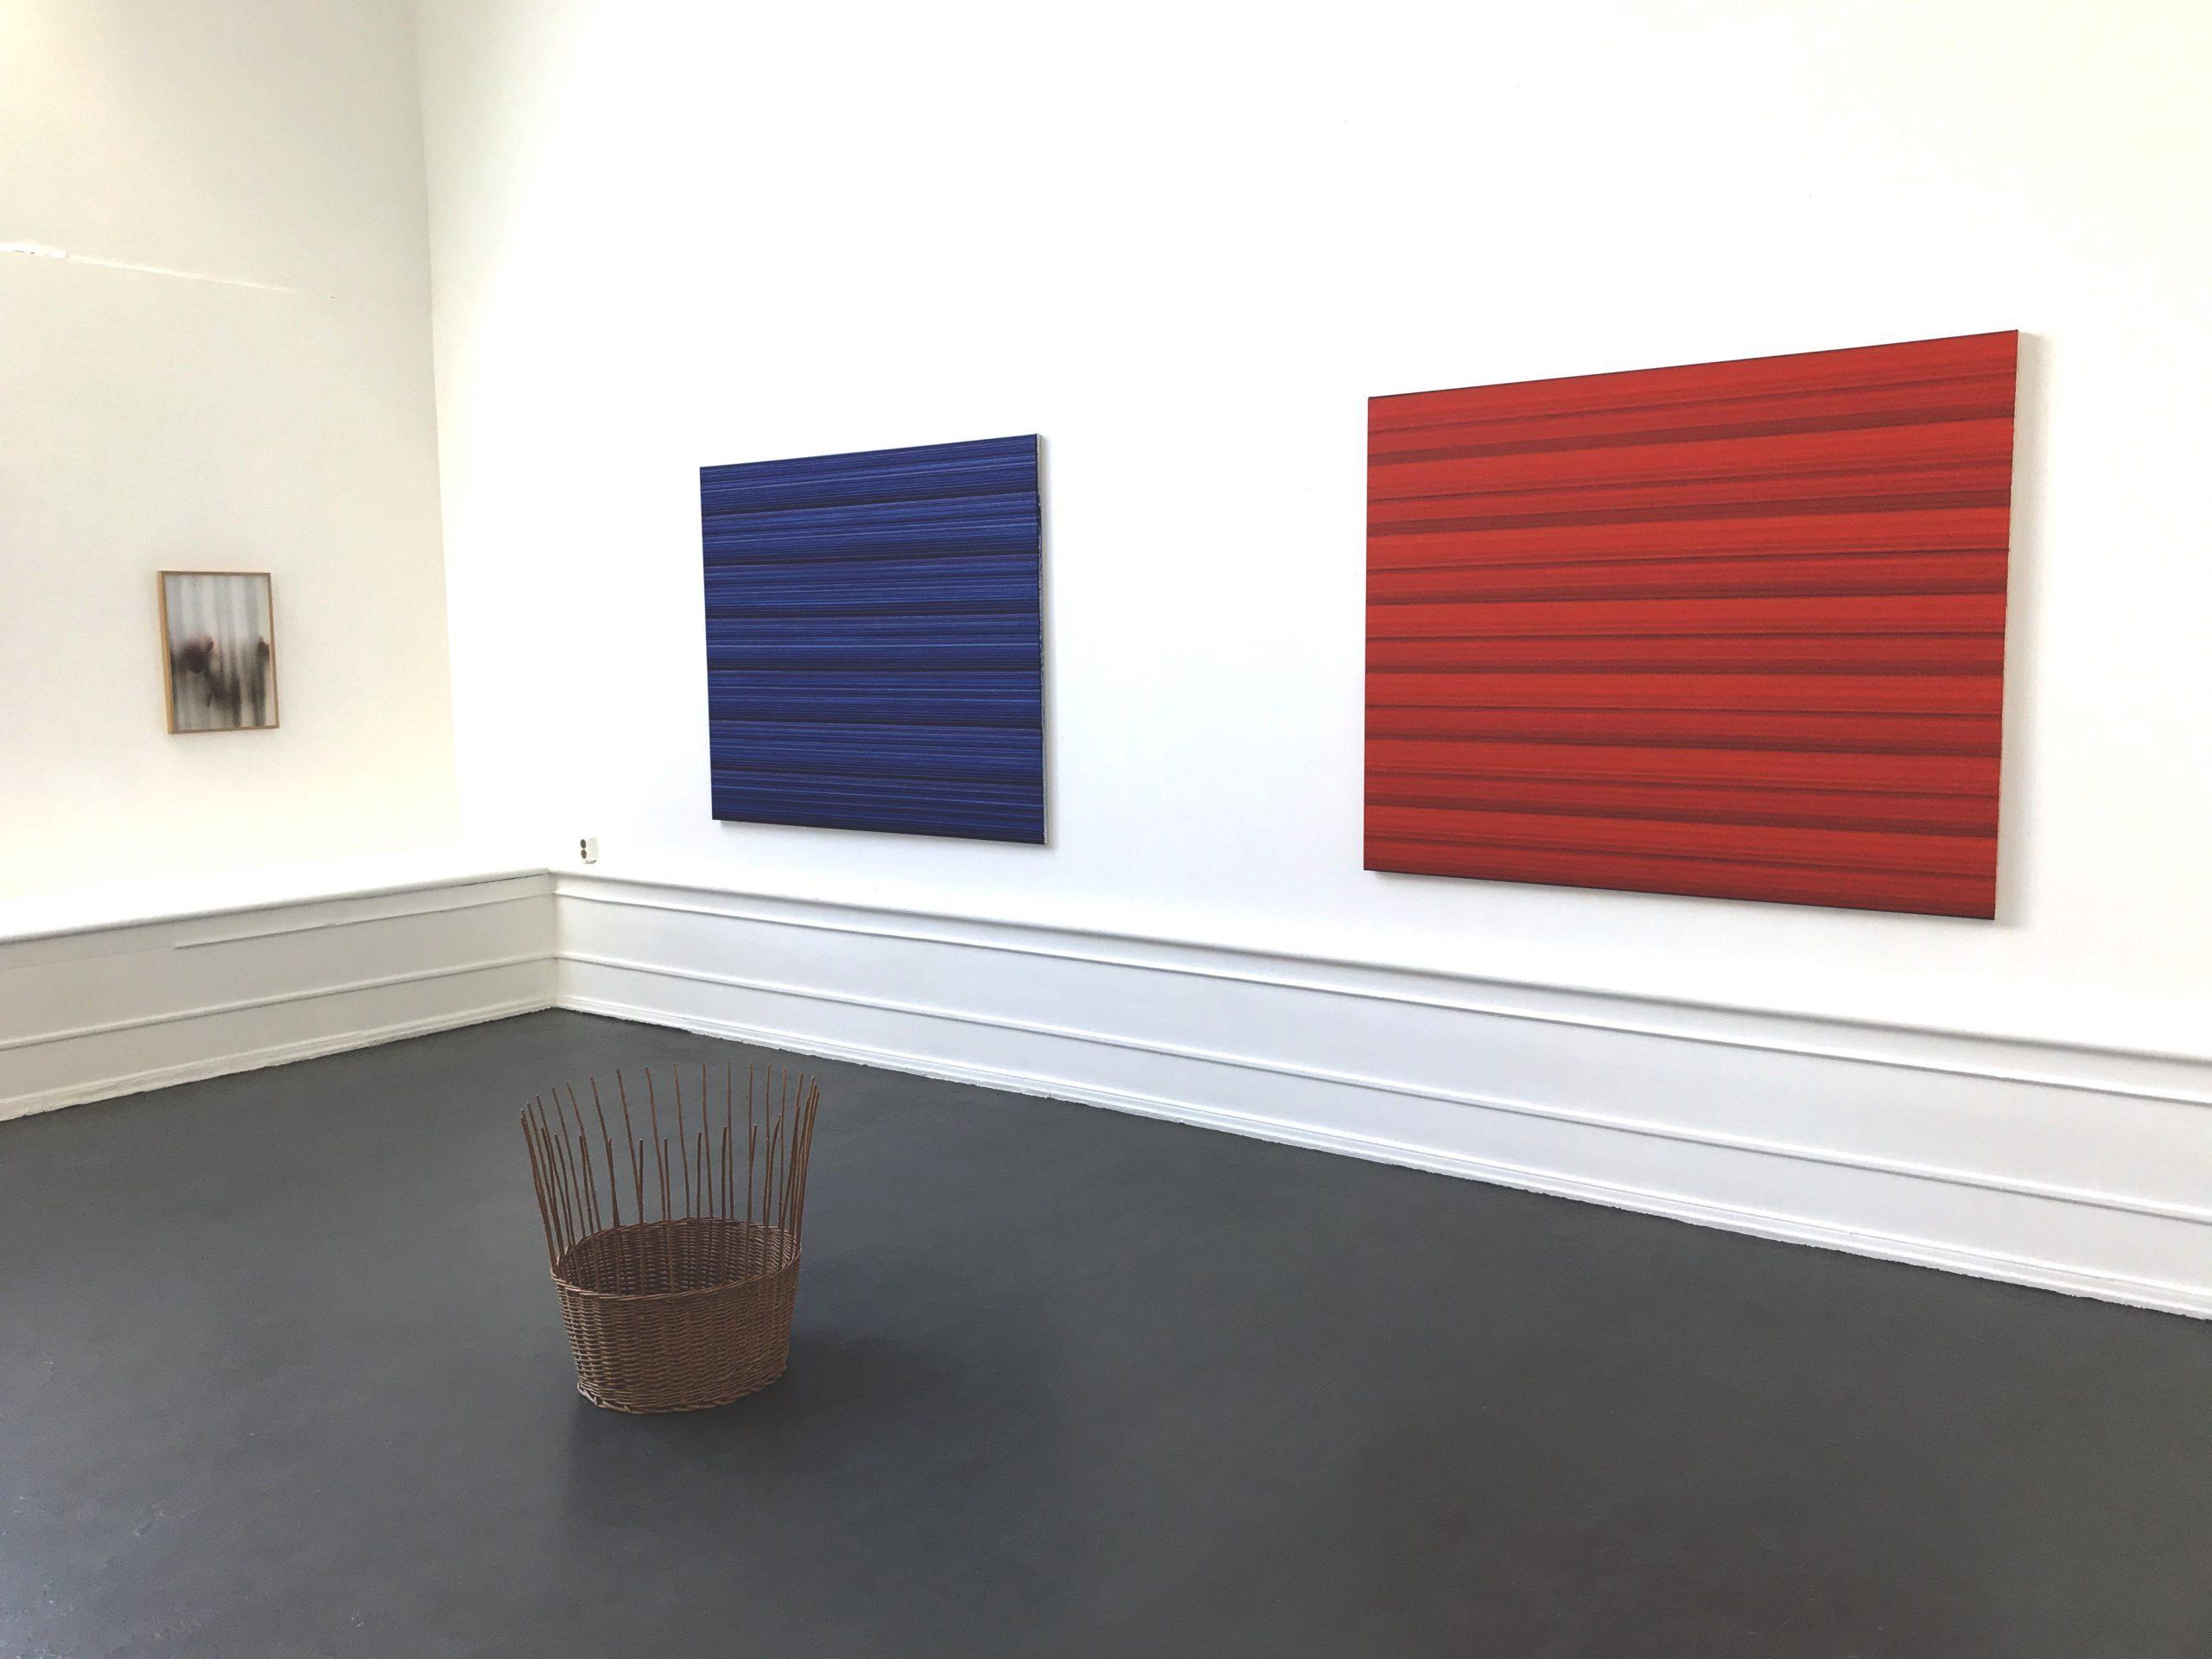 Ande och Materia / Mind and Matter, april 2020. Rickard Sollman (paintings), Kristina Eldon (photography)